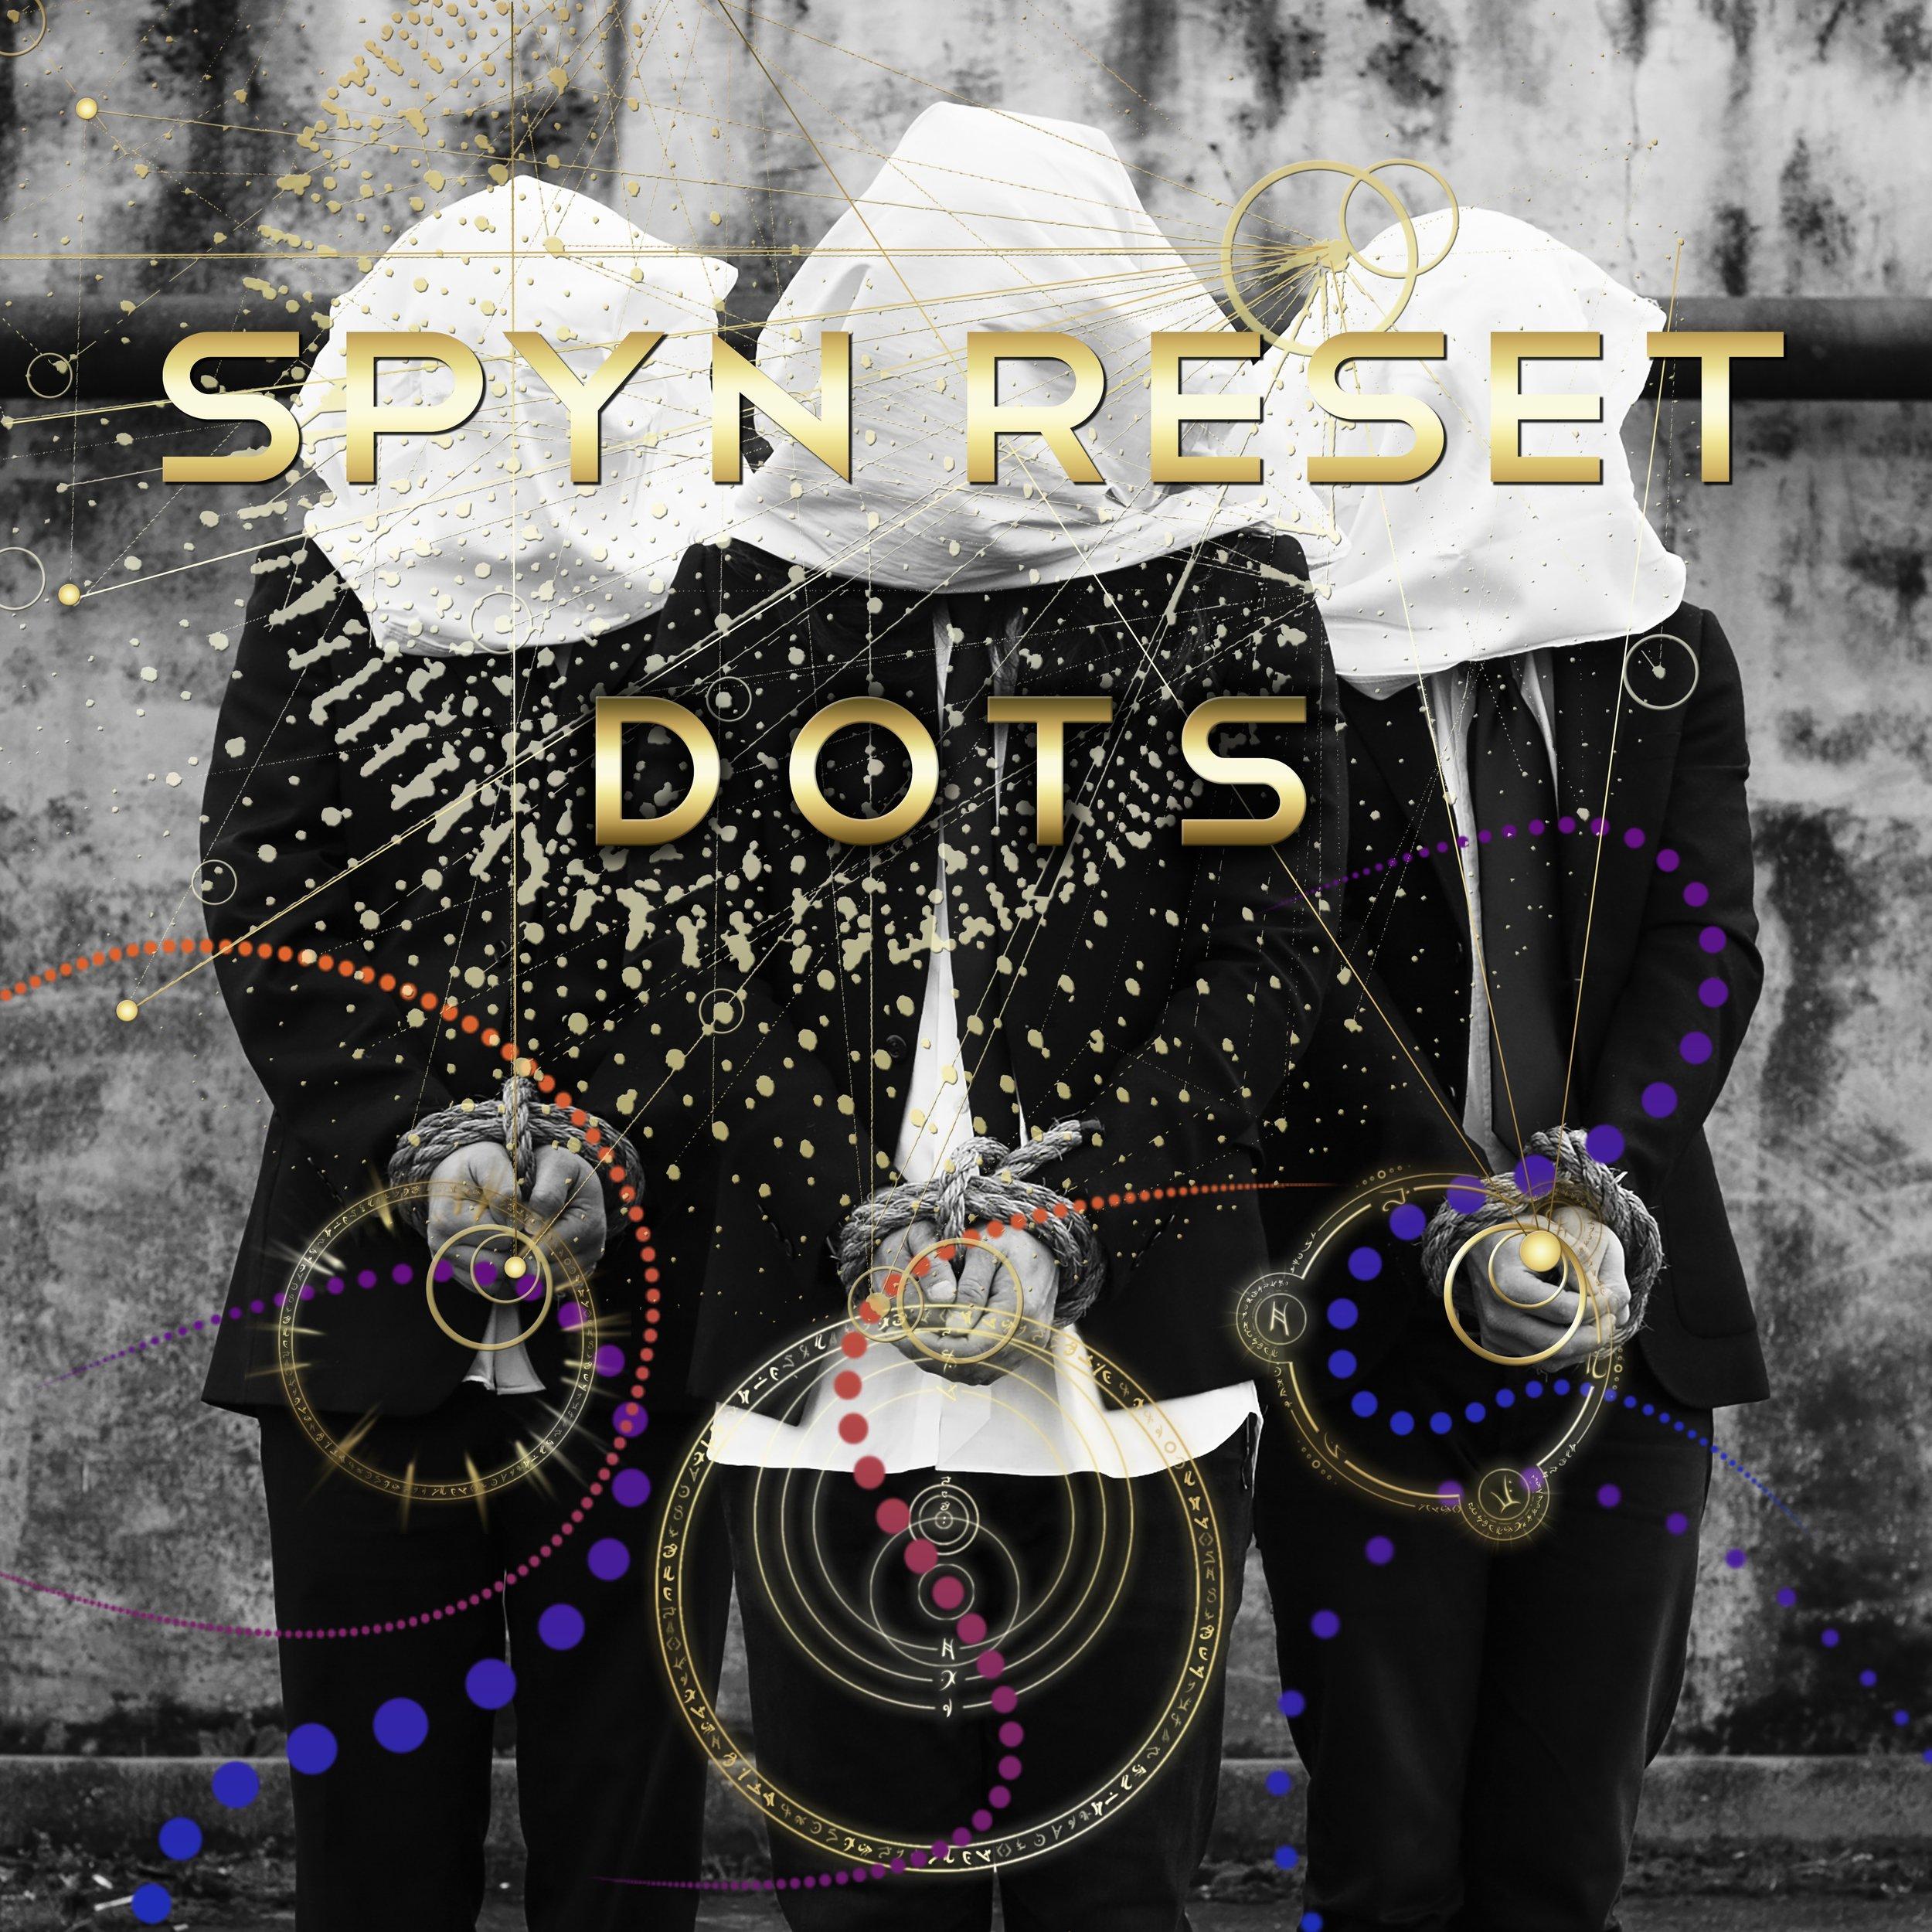 DOTSAlbumArtFront.jpg